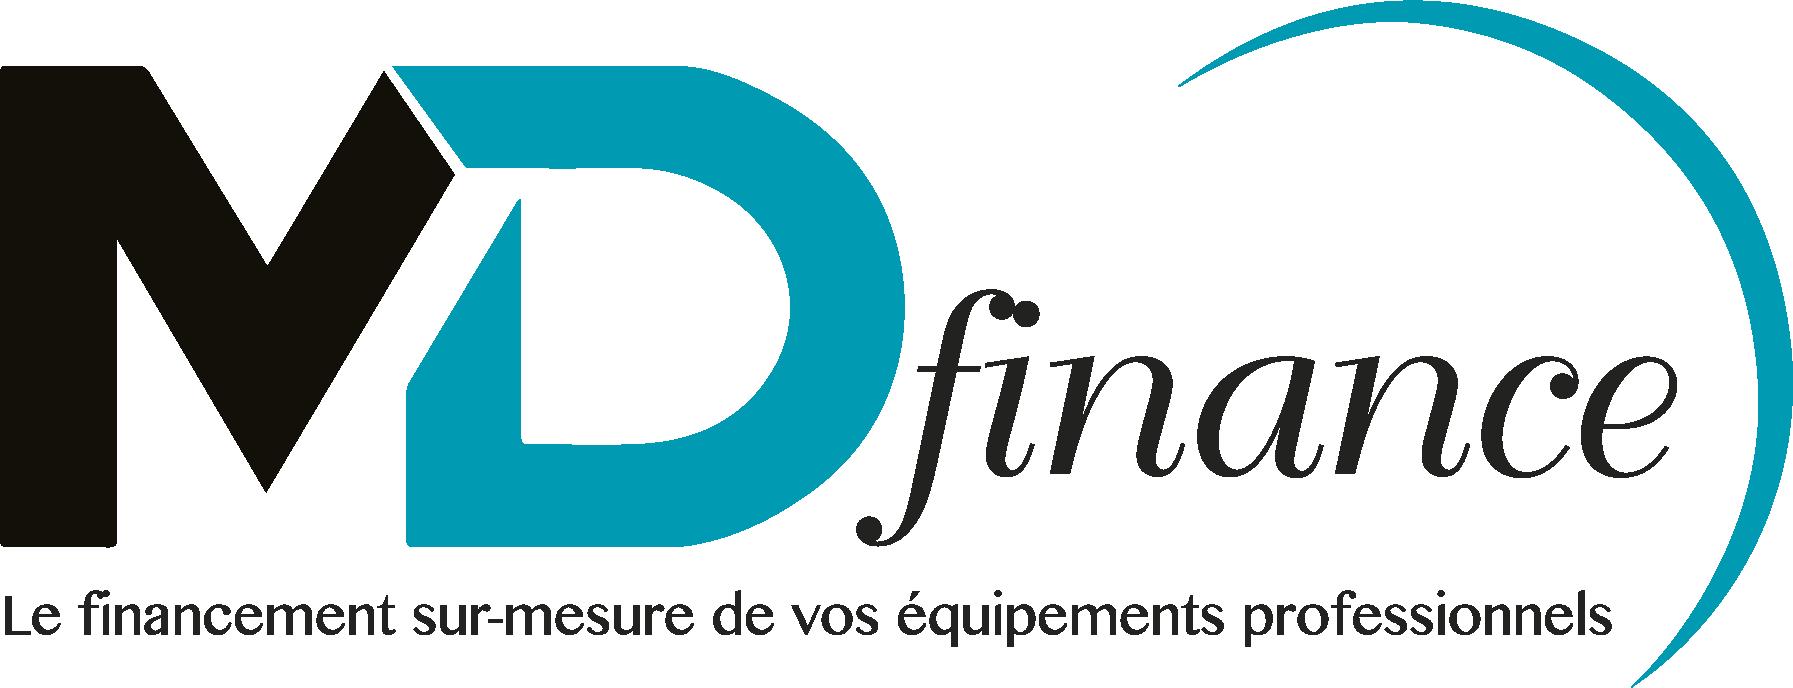 Logo MD Finance